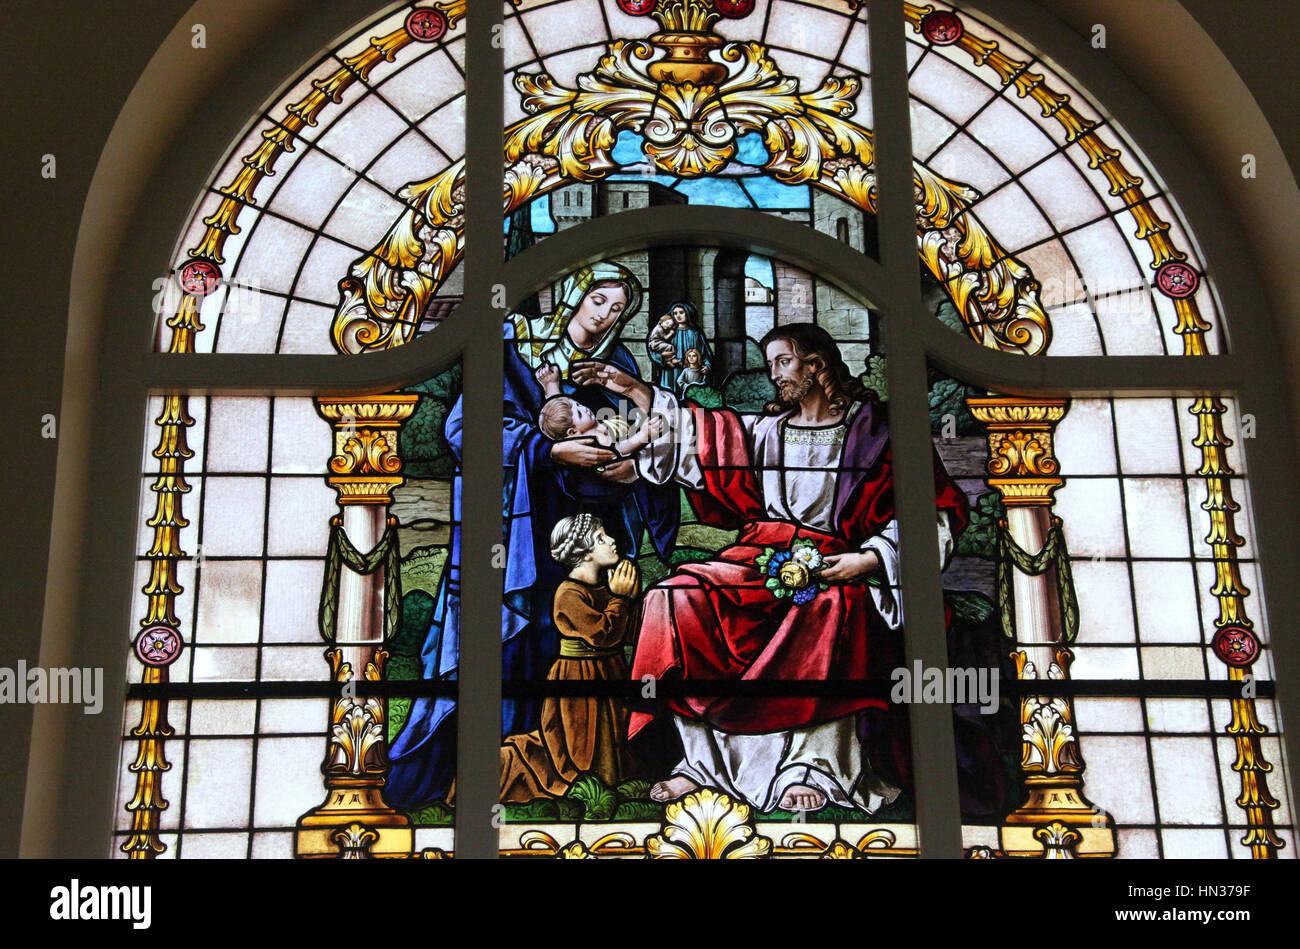 German speaking Evangelical Lutheran Church Window at Swakopmund in Namibia - Stock Image